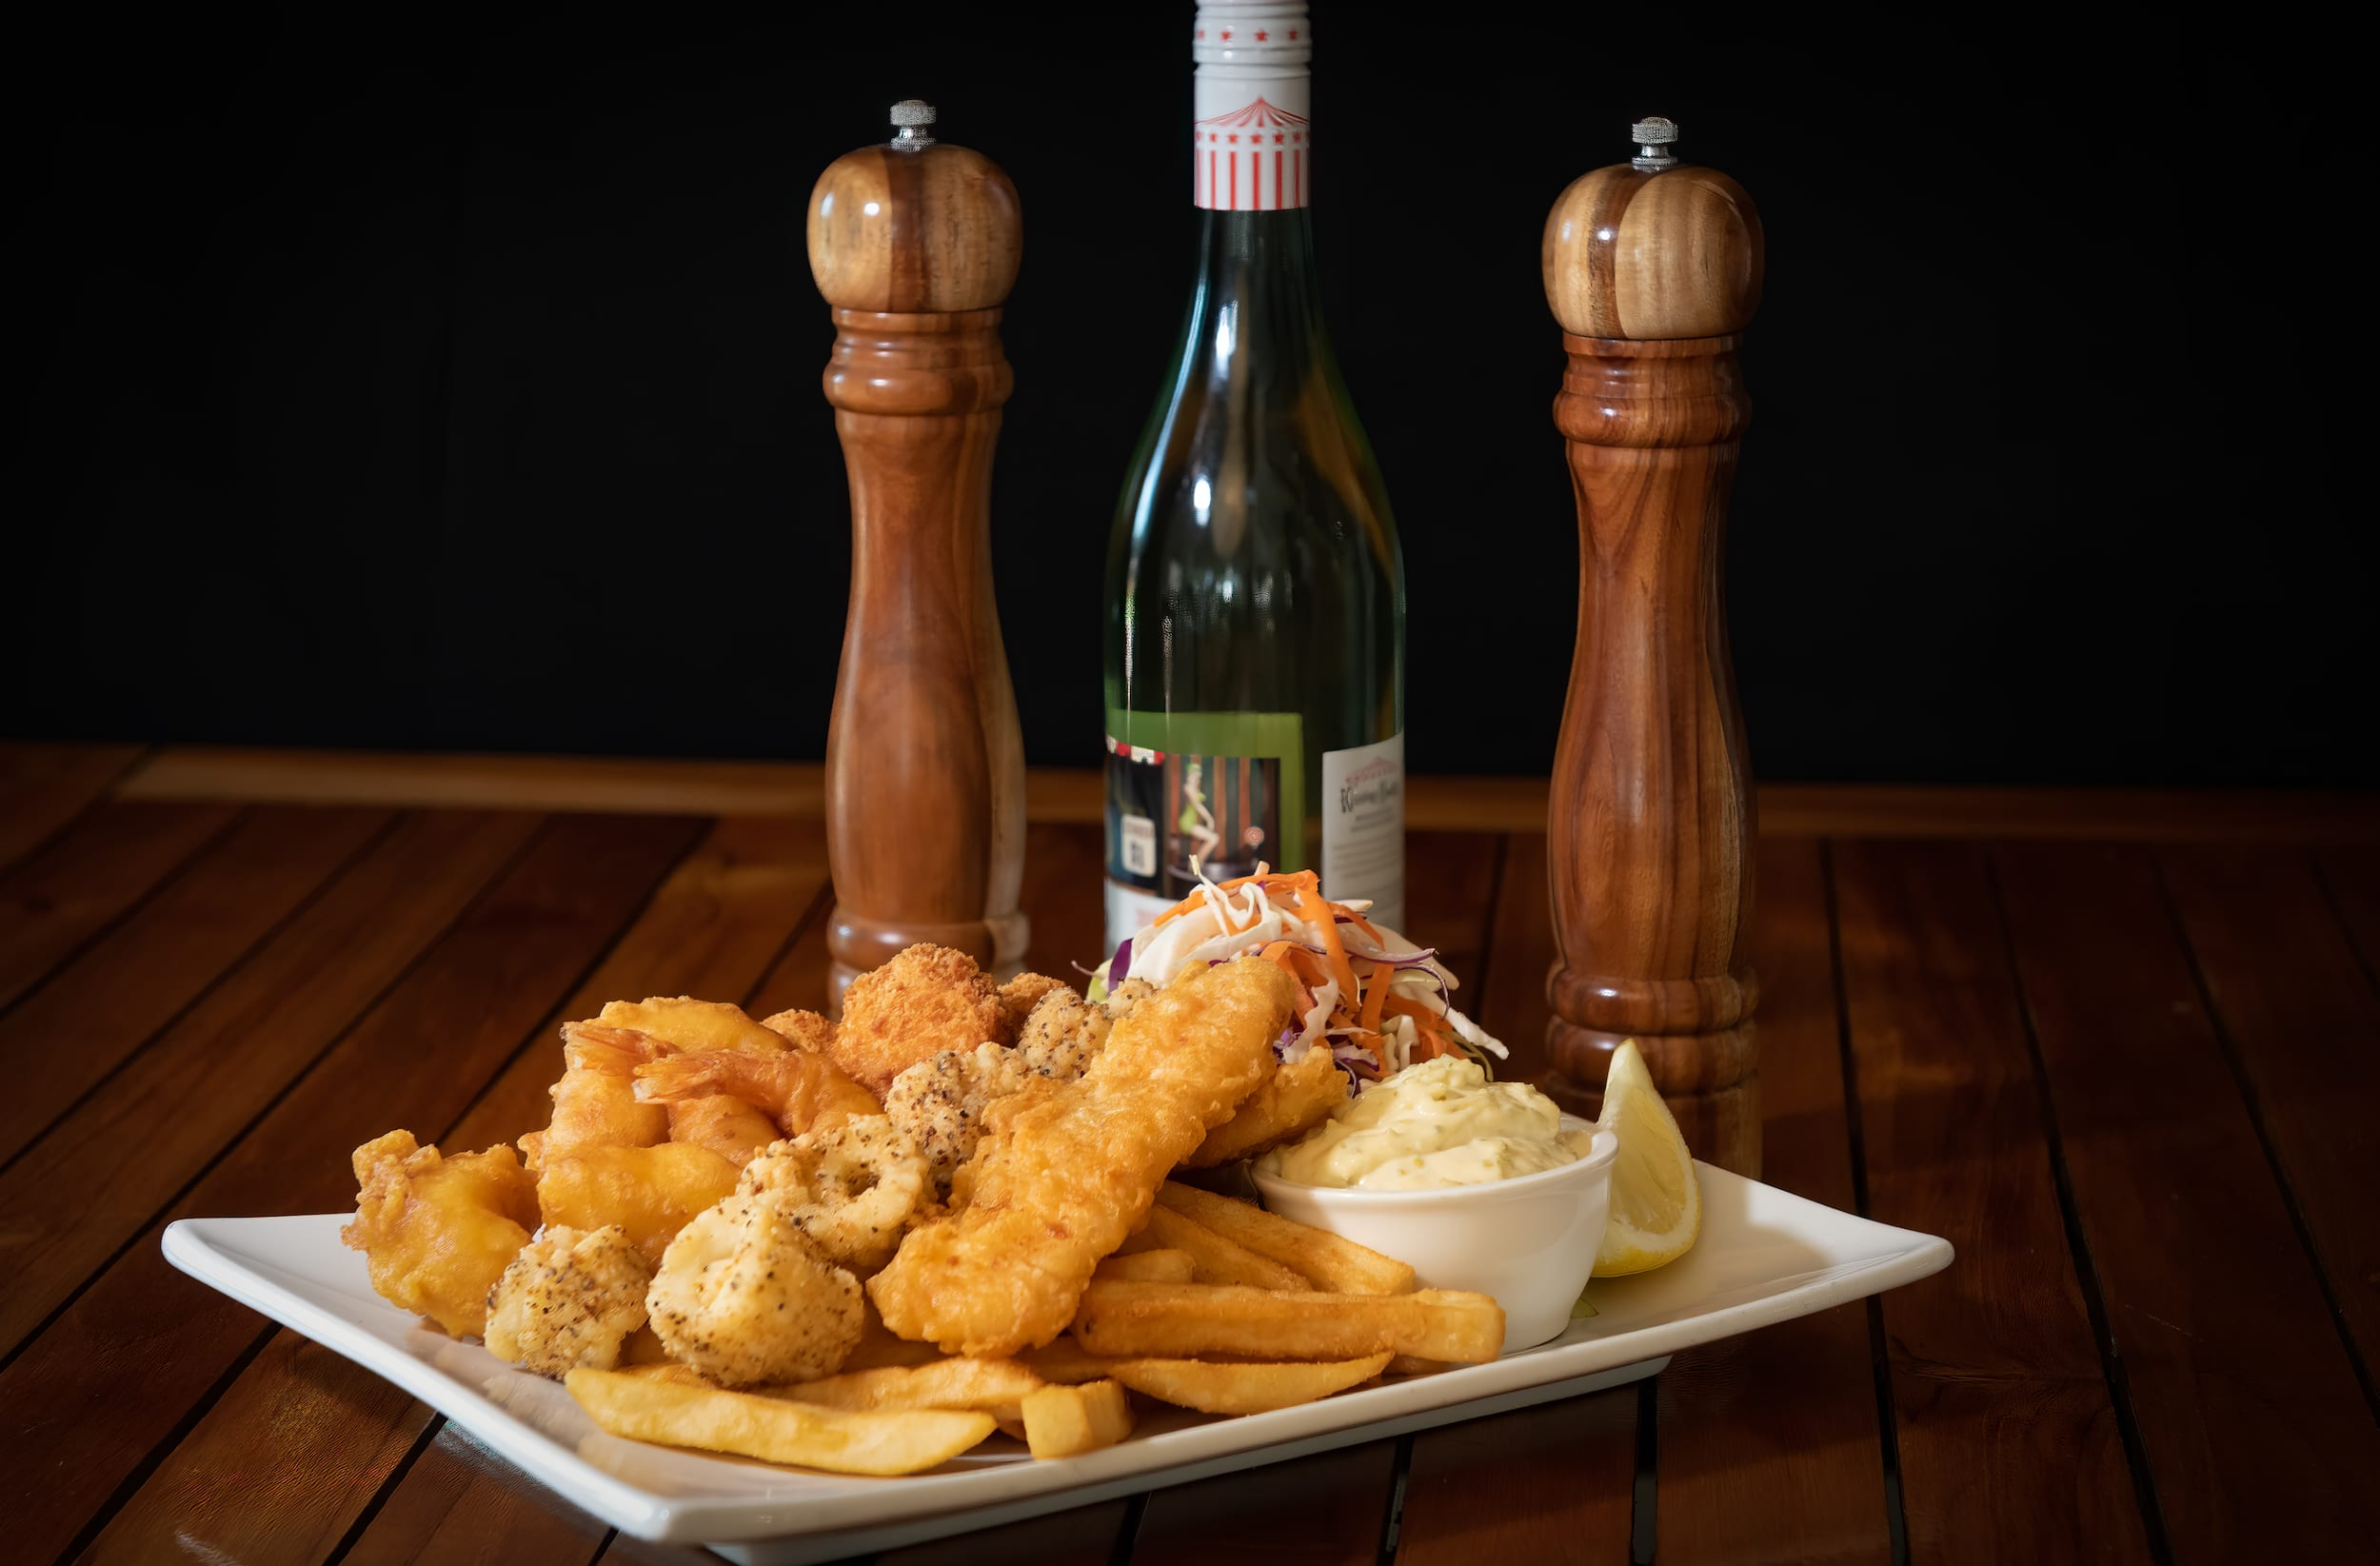 Seafood plate at Bago tavern near Port Macquarie